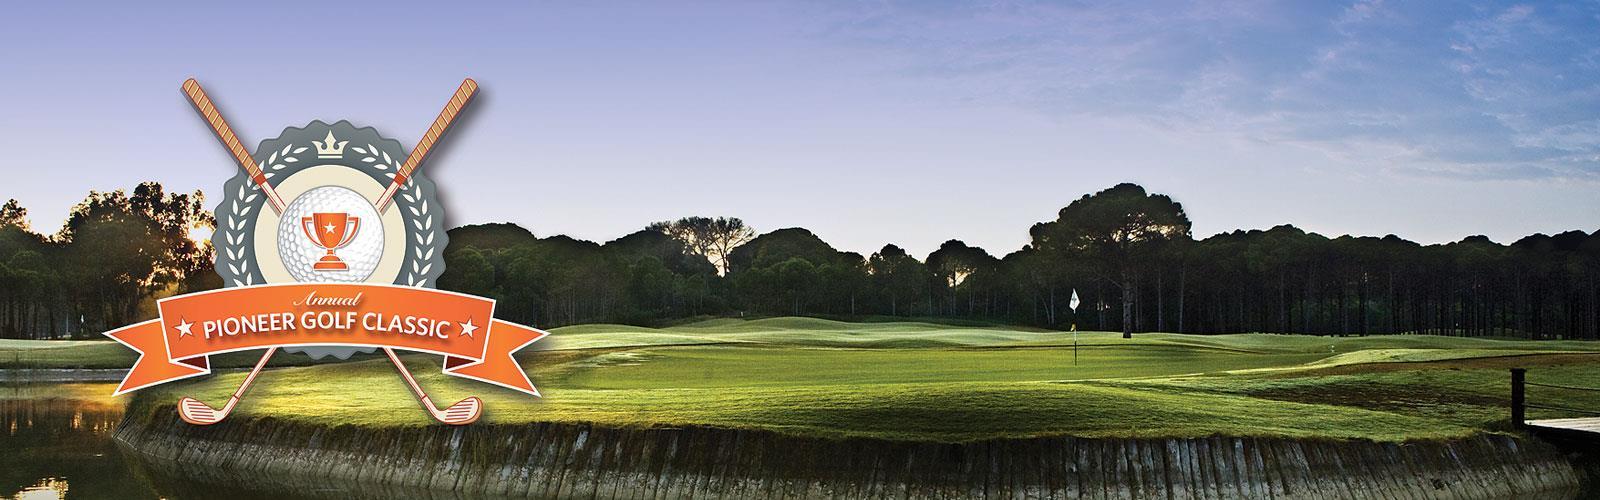 48th Annual Pioneer Golf Classic